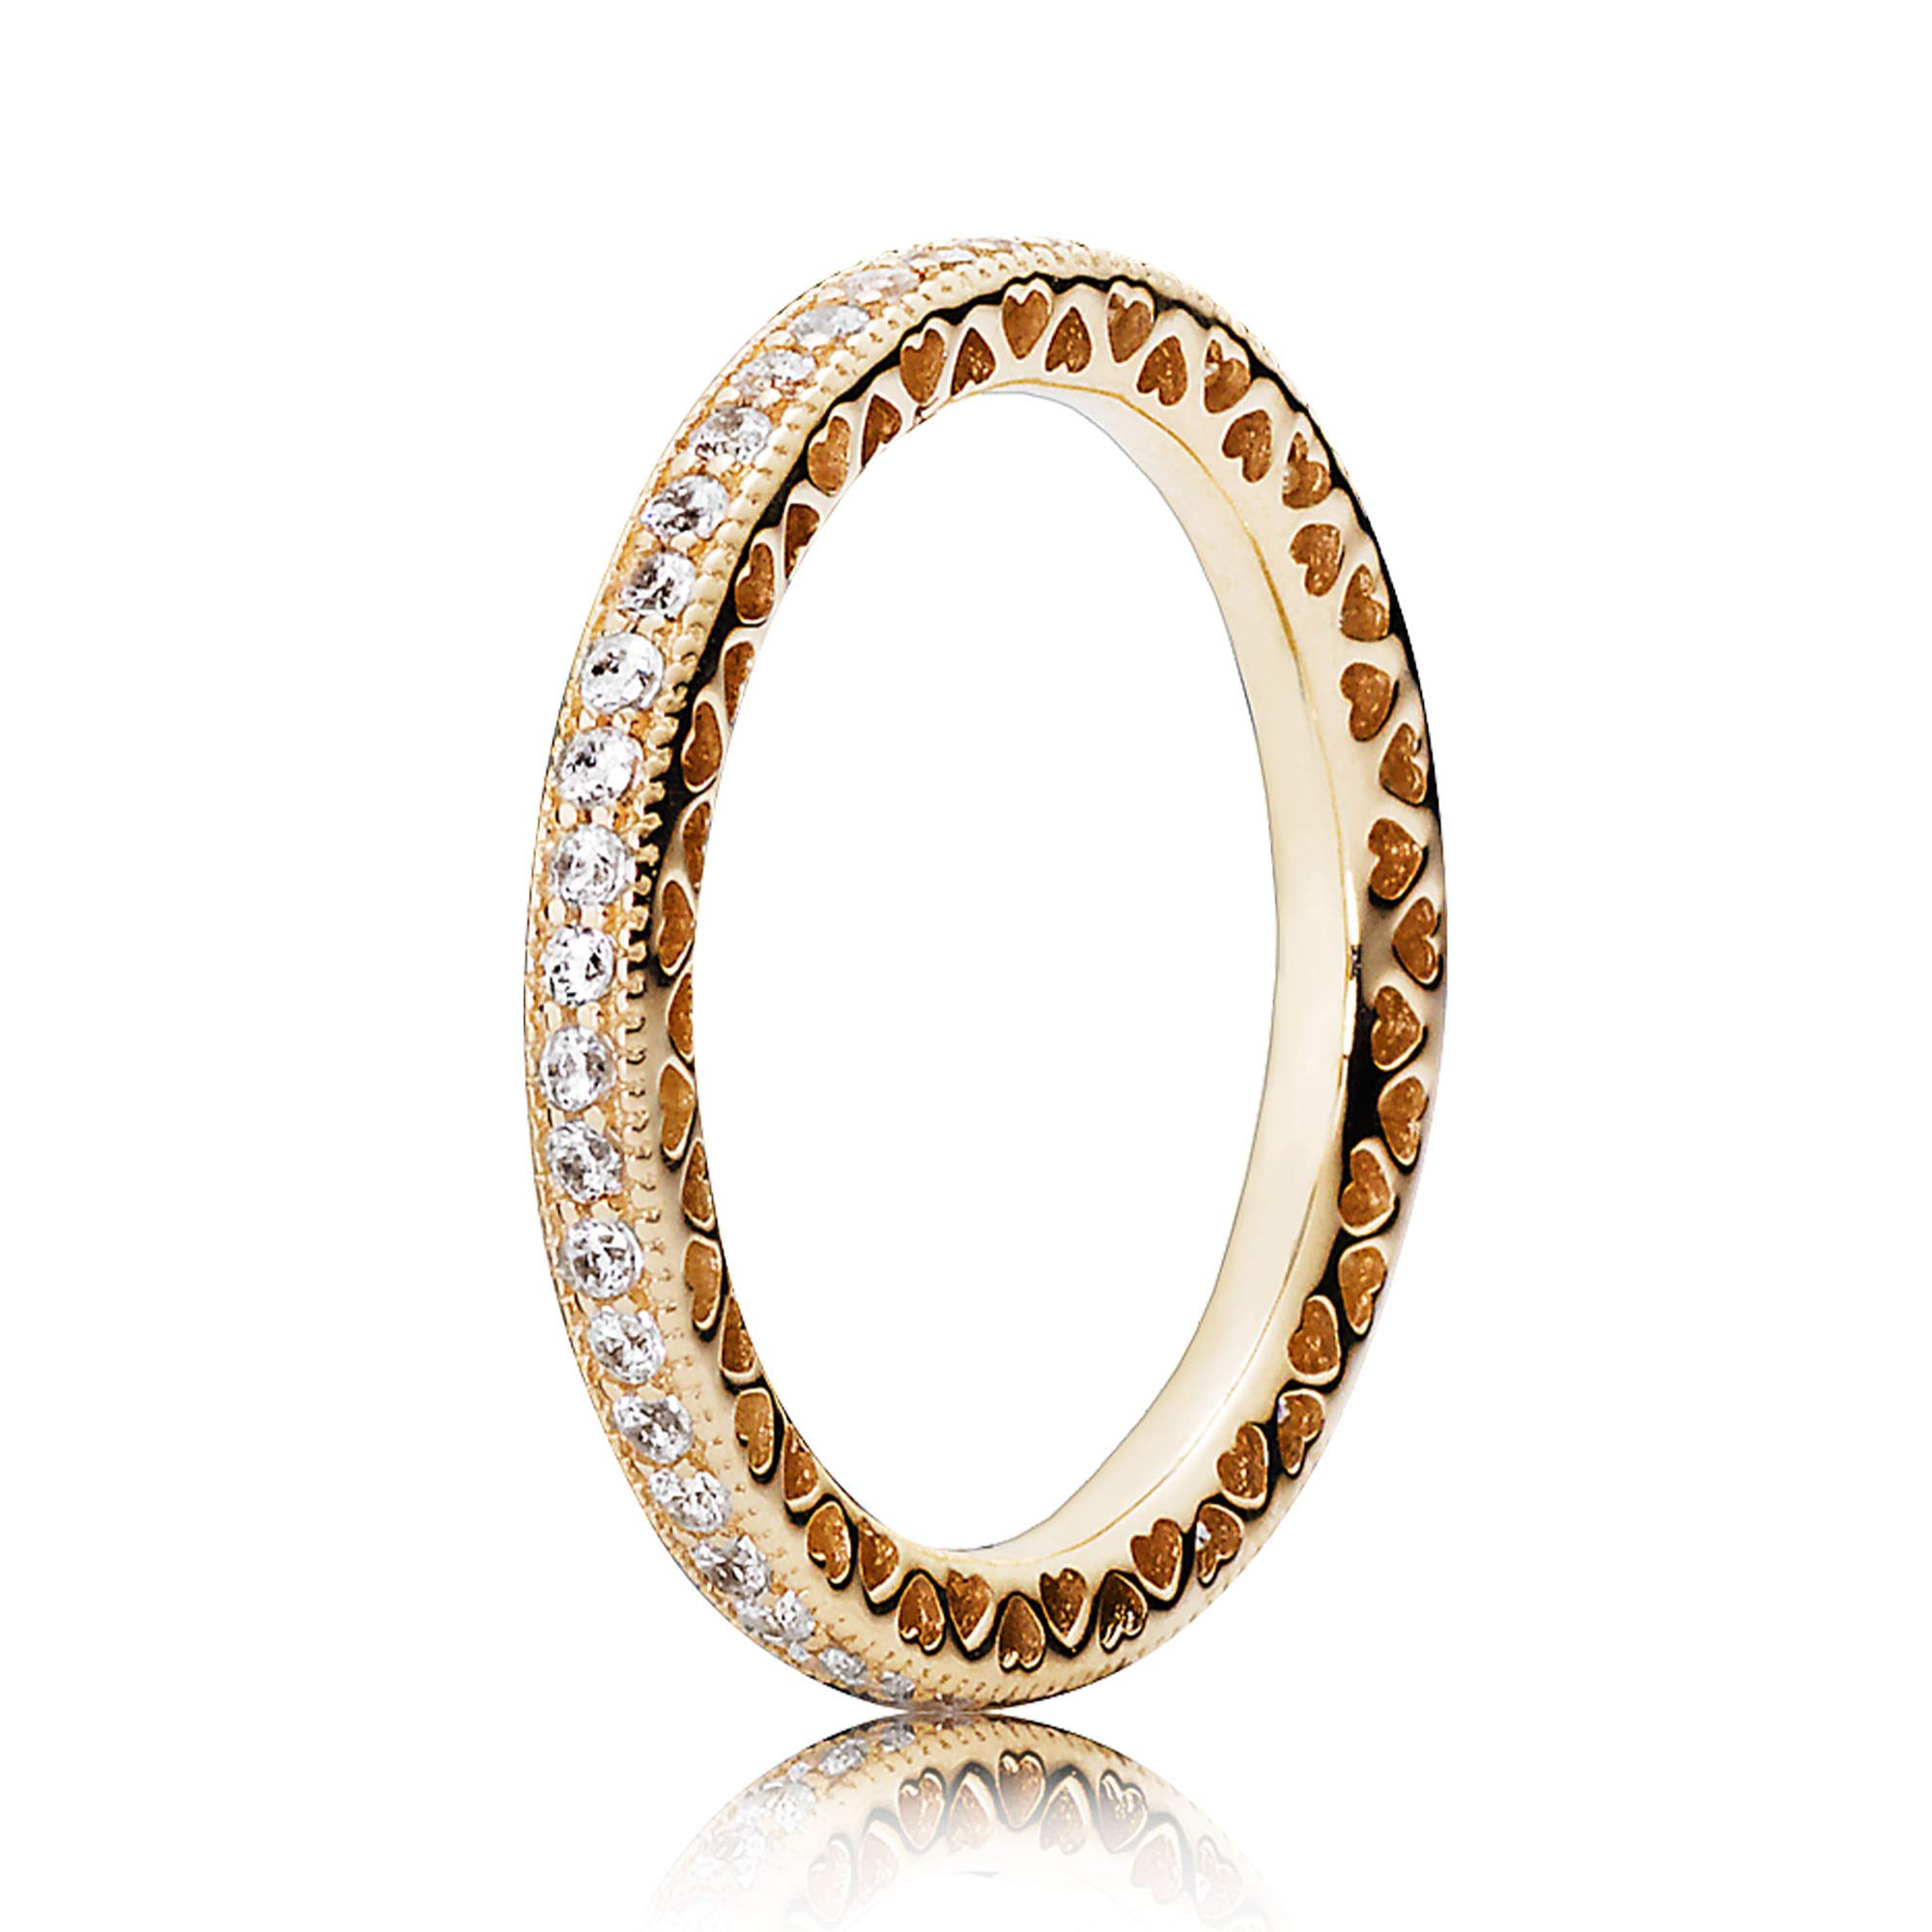 Pandora Jewelry Hearts of Pandora Cubic Zirconia Ring in Gold 14K, Size 7.5